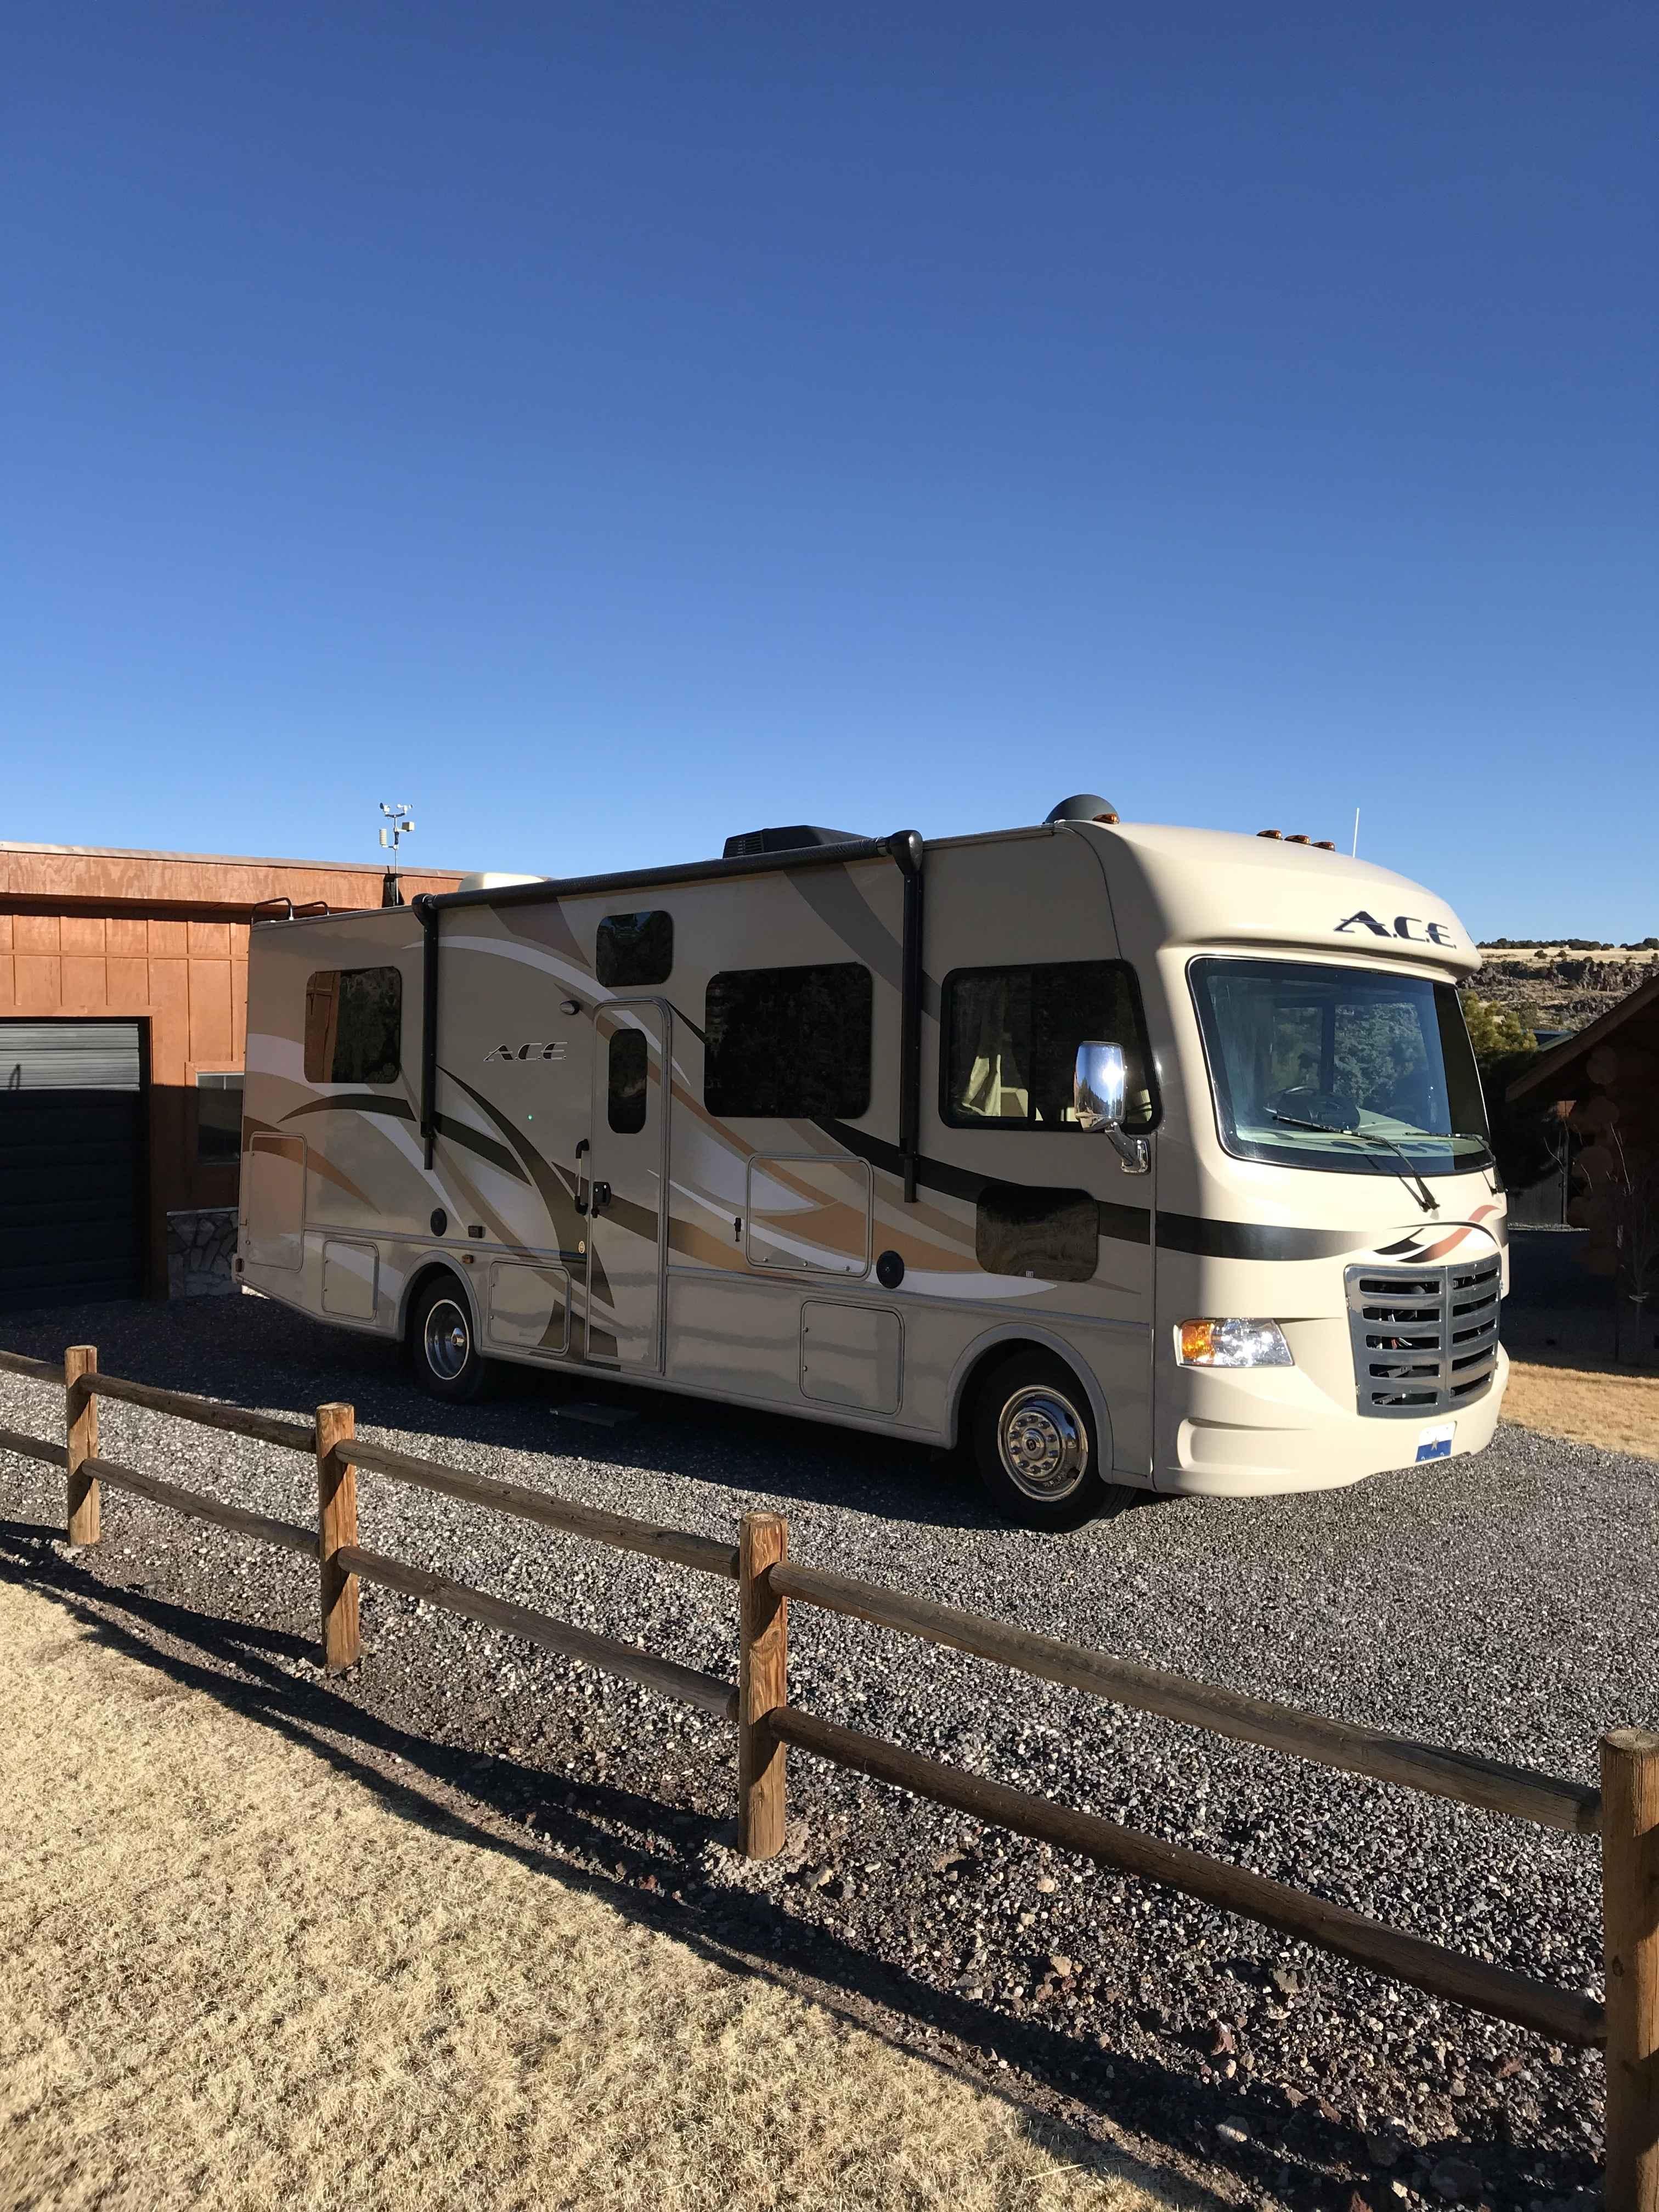 2015 used thor motor coach a c e 29 2 class a in arizona az for Motors and vehicles az